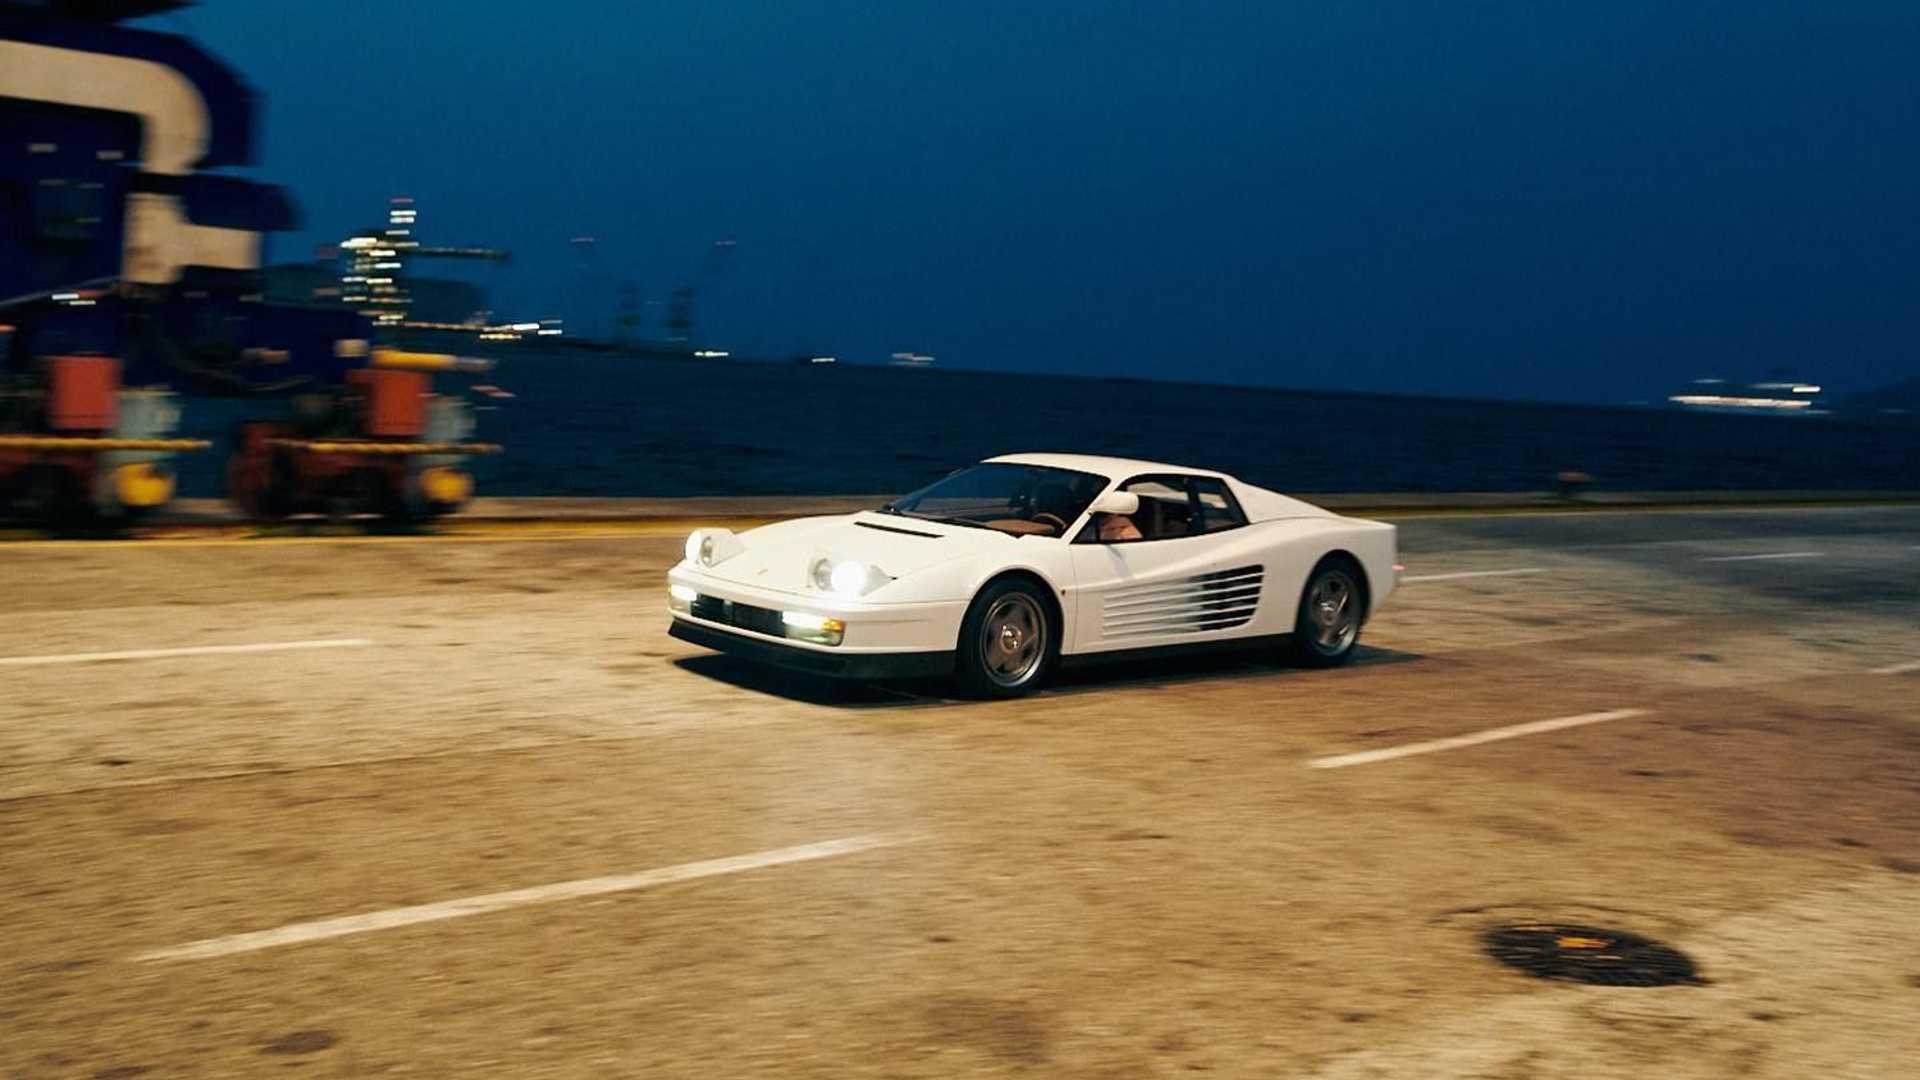 Ferrari-Testarossa-restomod-Officine-Fioravanti-4